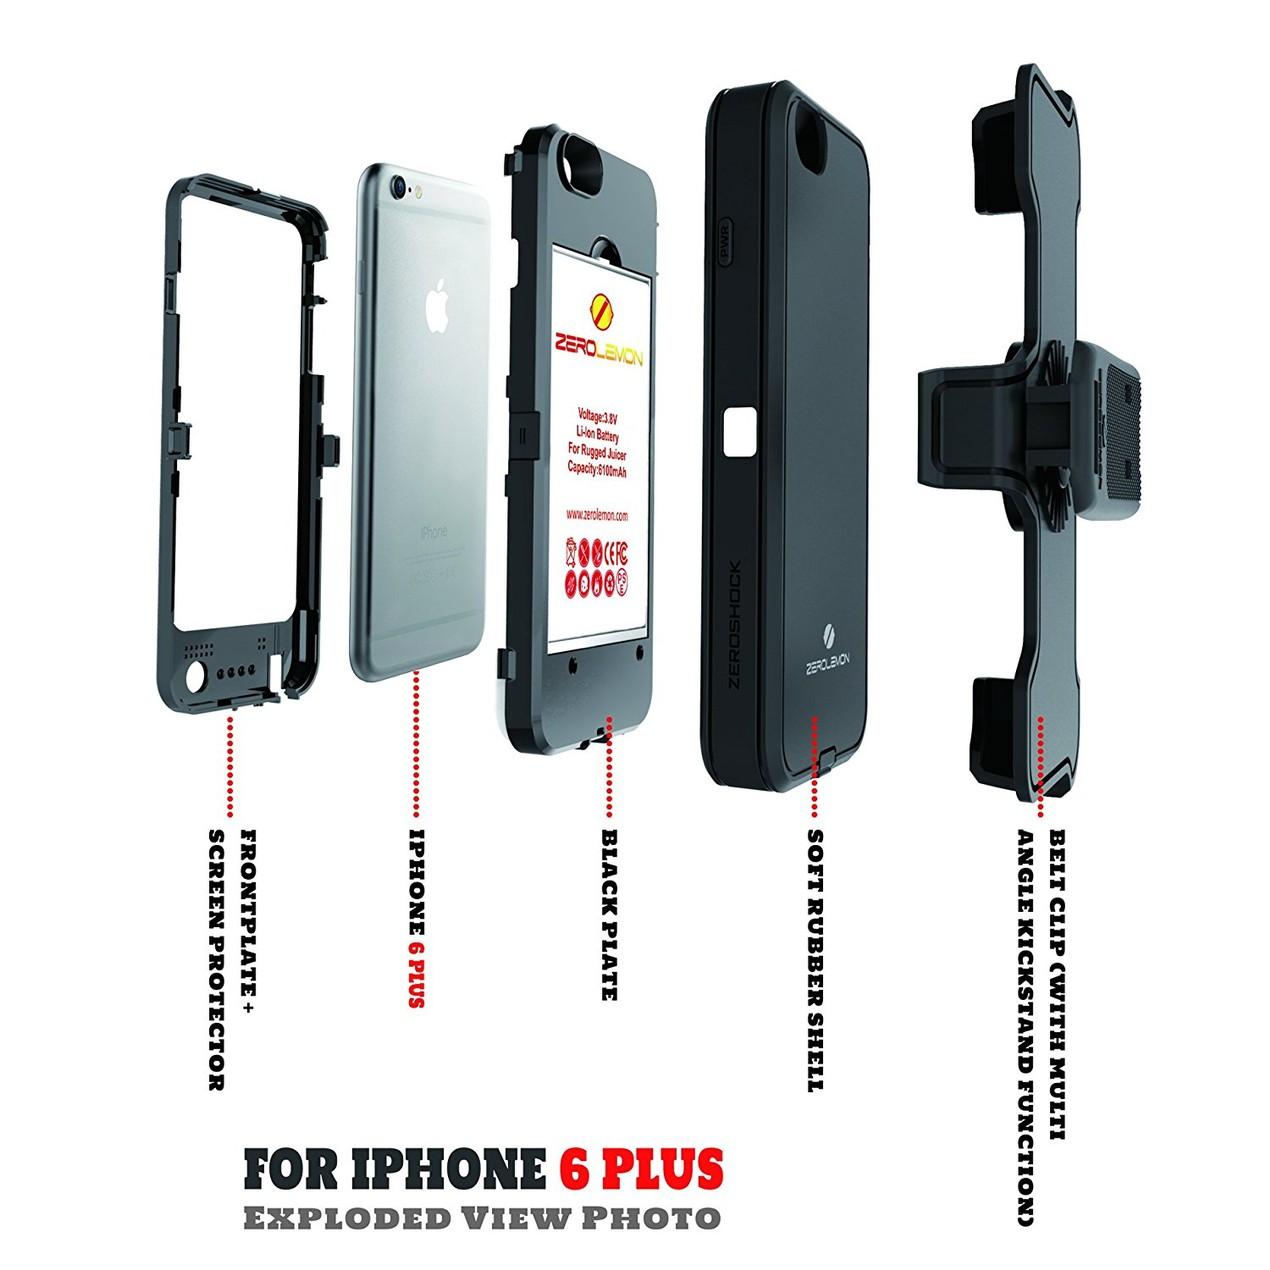 quality design a0efc 8aa50 ZeroLemon 9000mAh ZeroShock Double Layer Hybrid Case for iPhone 6/6s ...